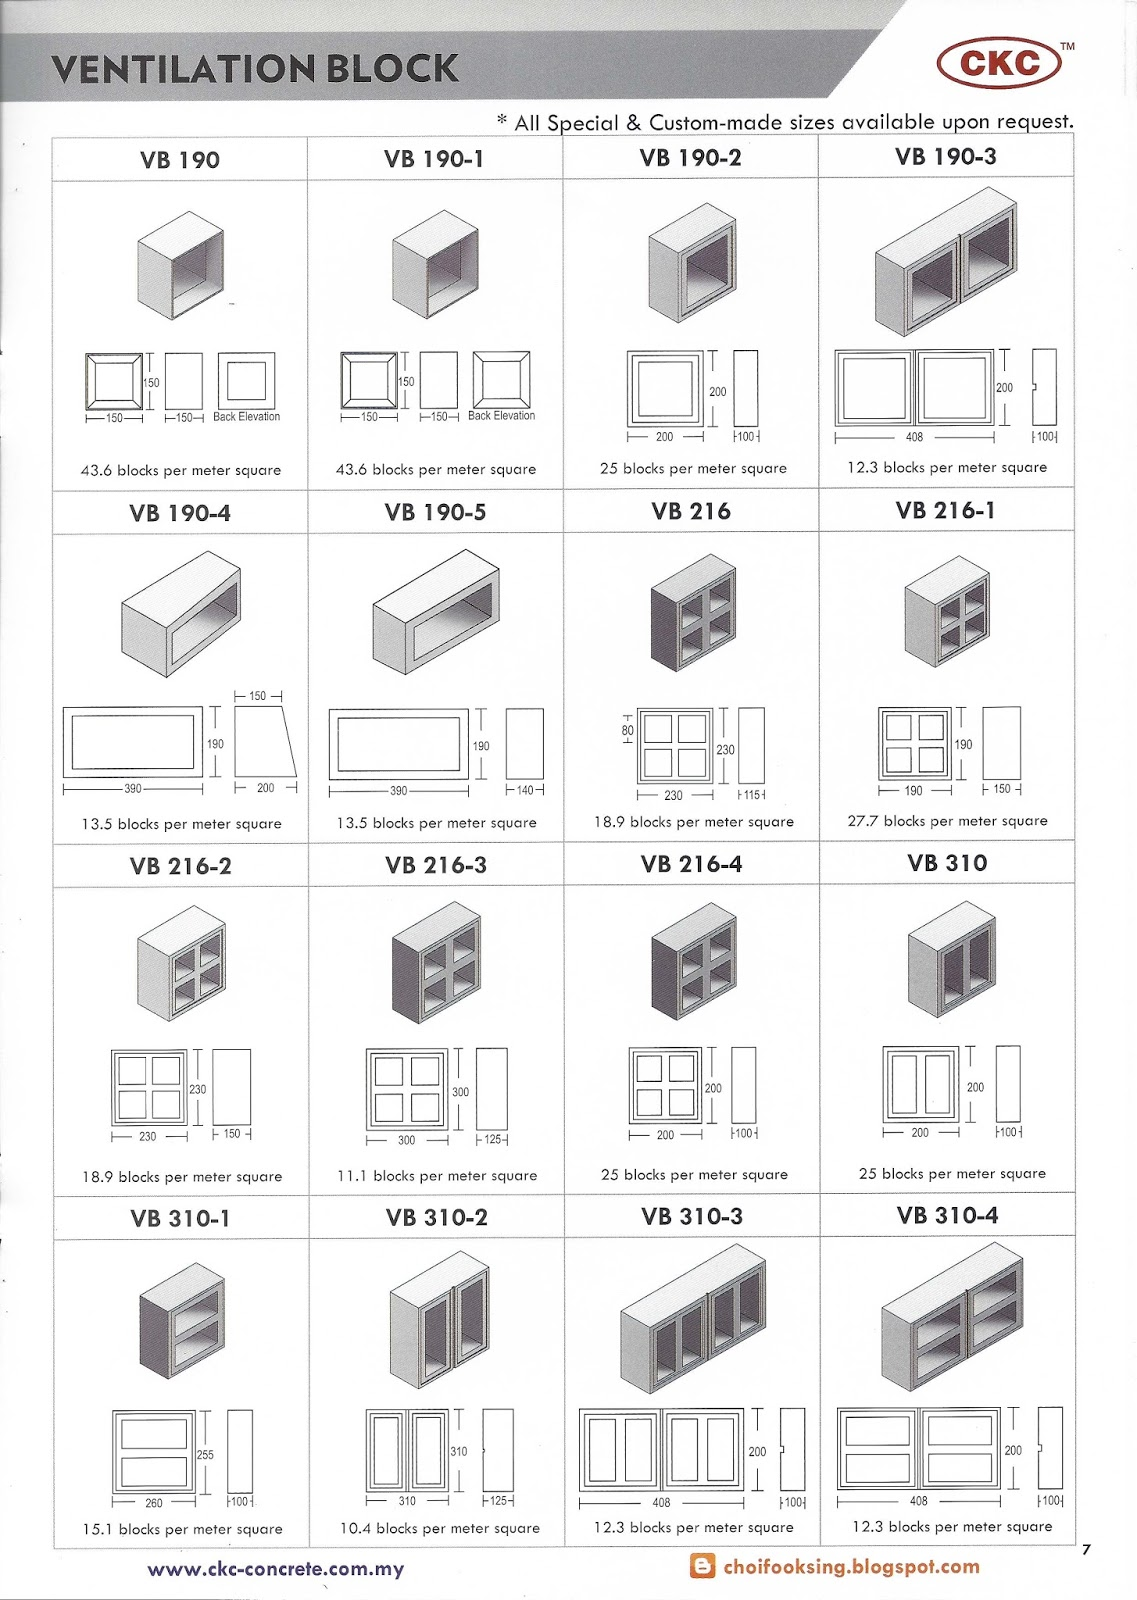 Vent block size